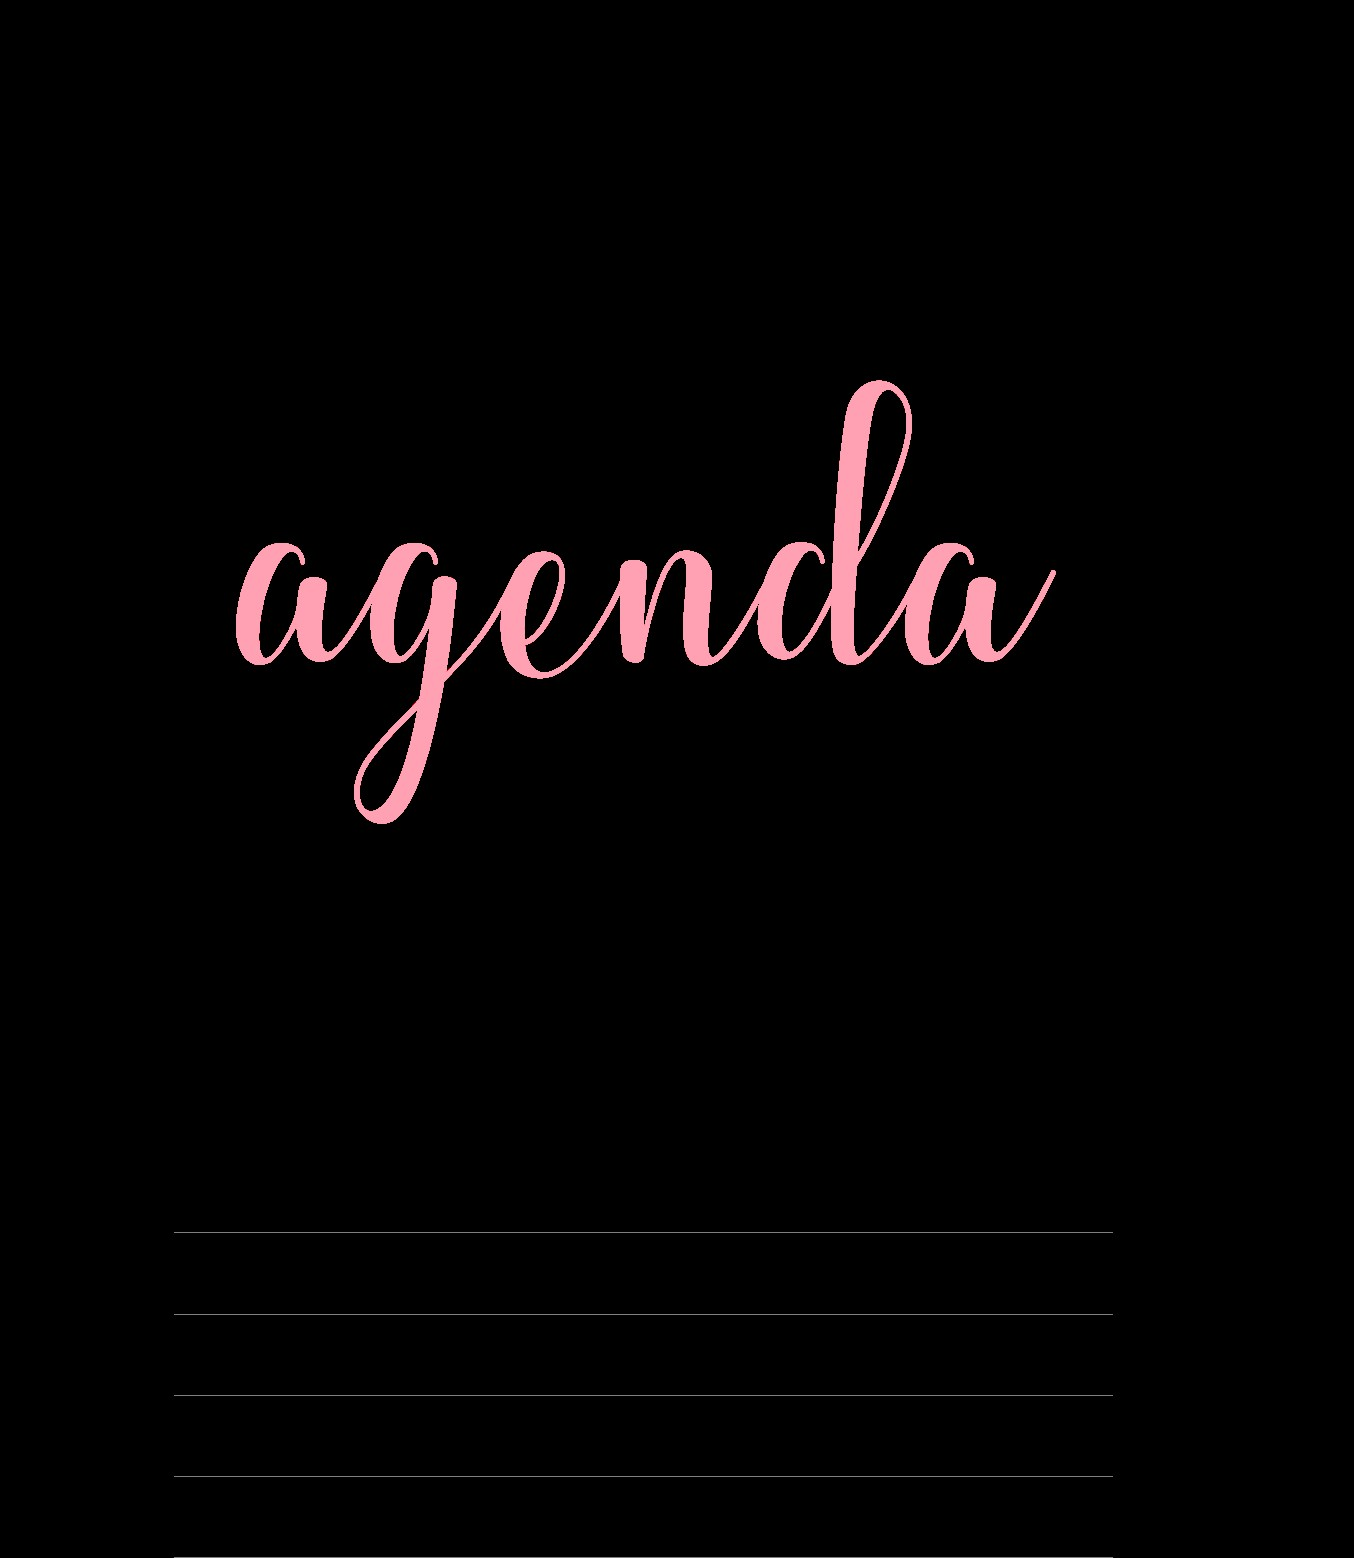 Happy planner imprimible gratis 2017 Agenda Planner Happy Planner Bullet Journals Free Printable